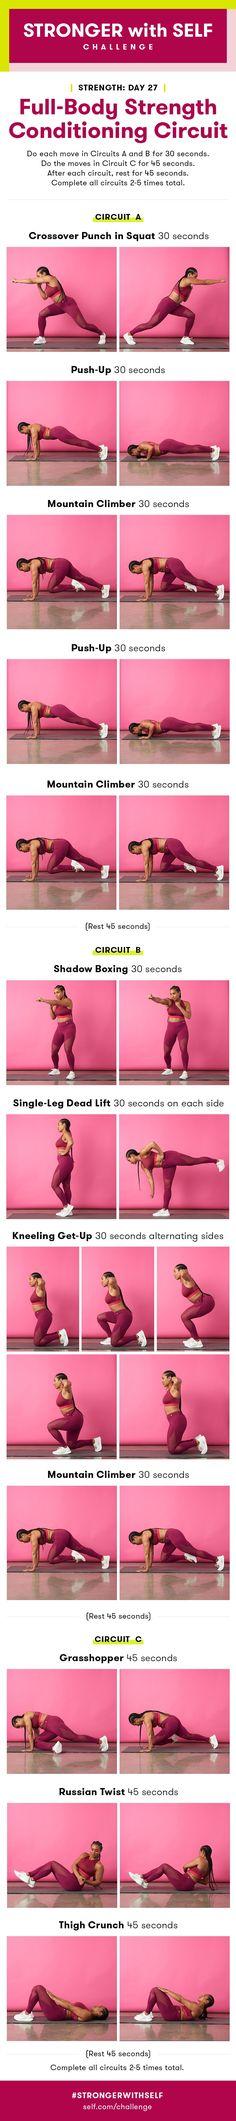 Full-Body Strength Conditioning Circuit